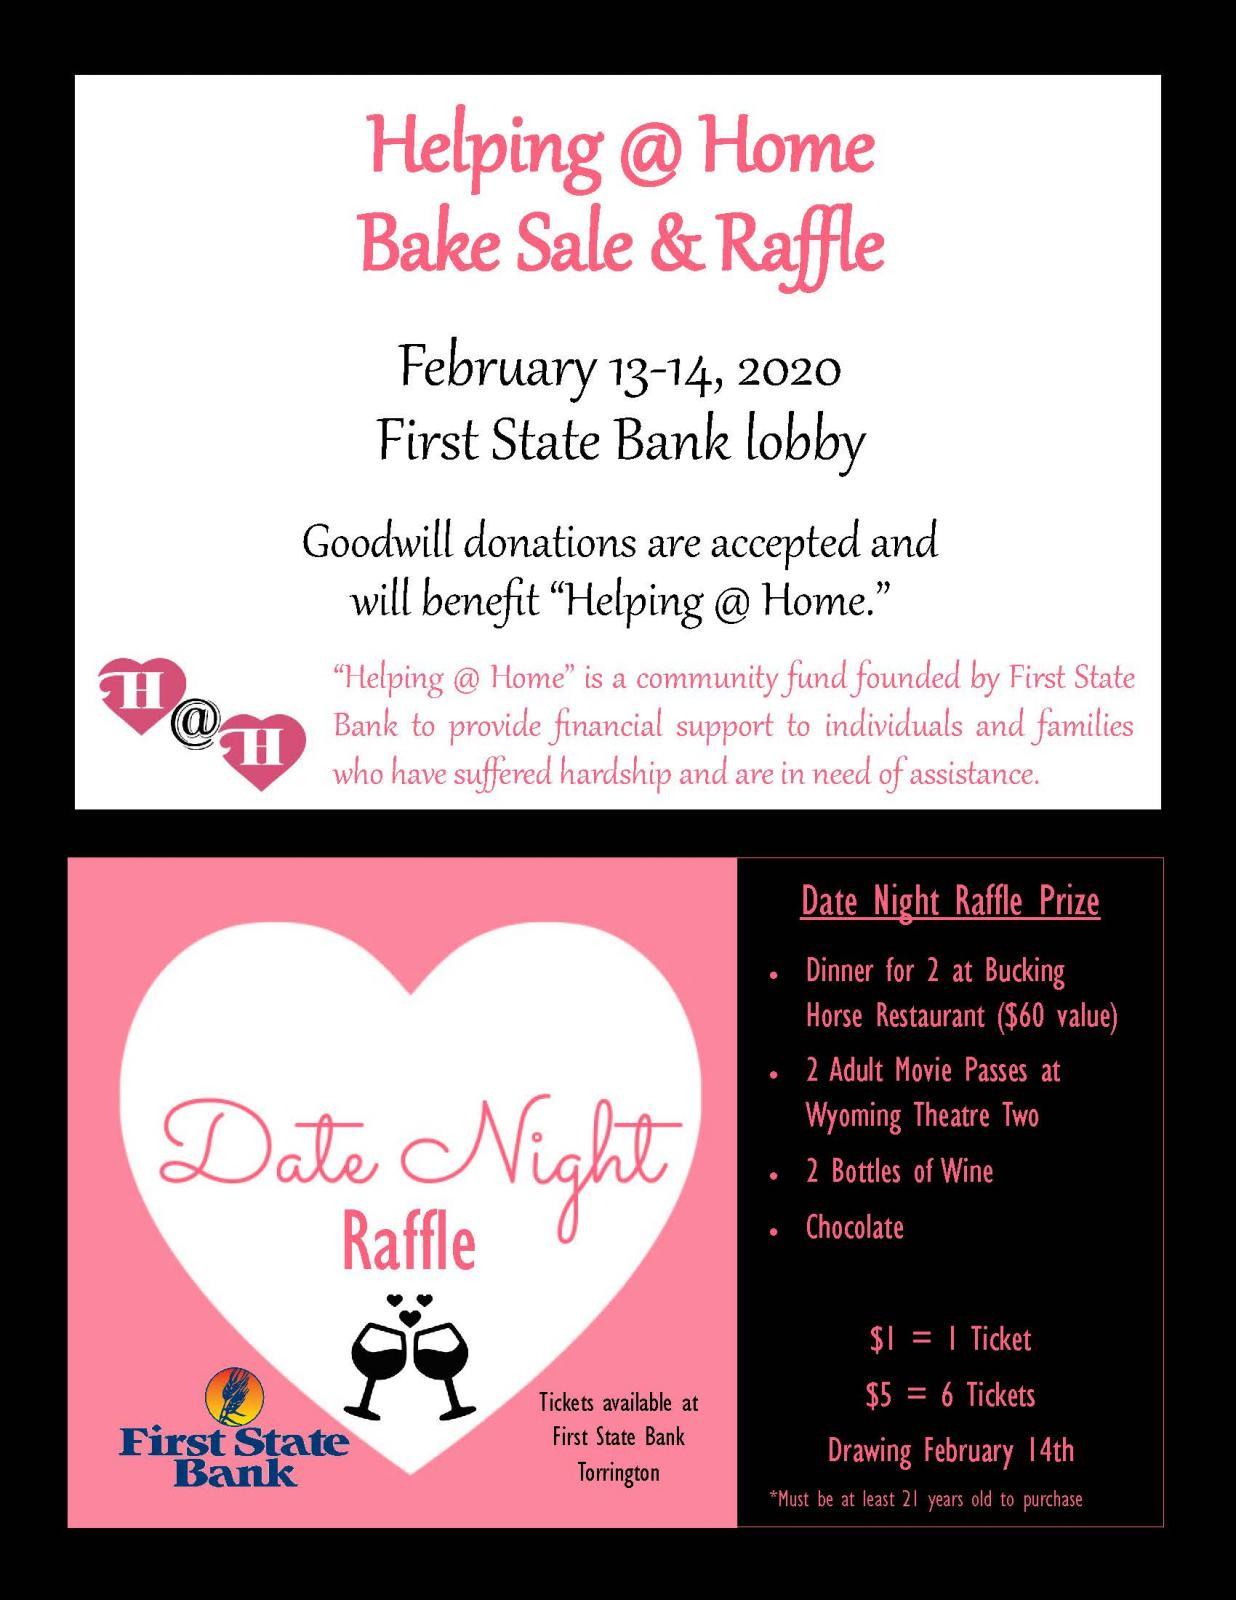 Helping @ Home Bake Sale & Raffle Photo